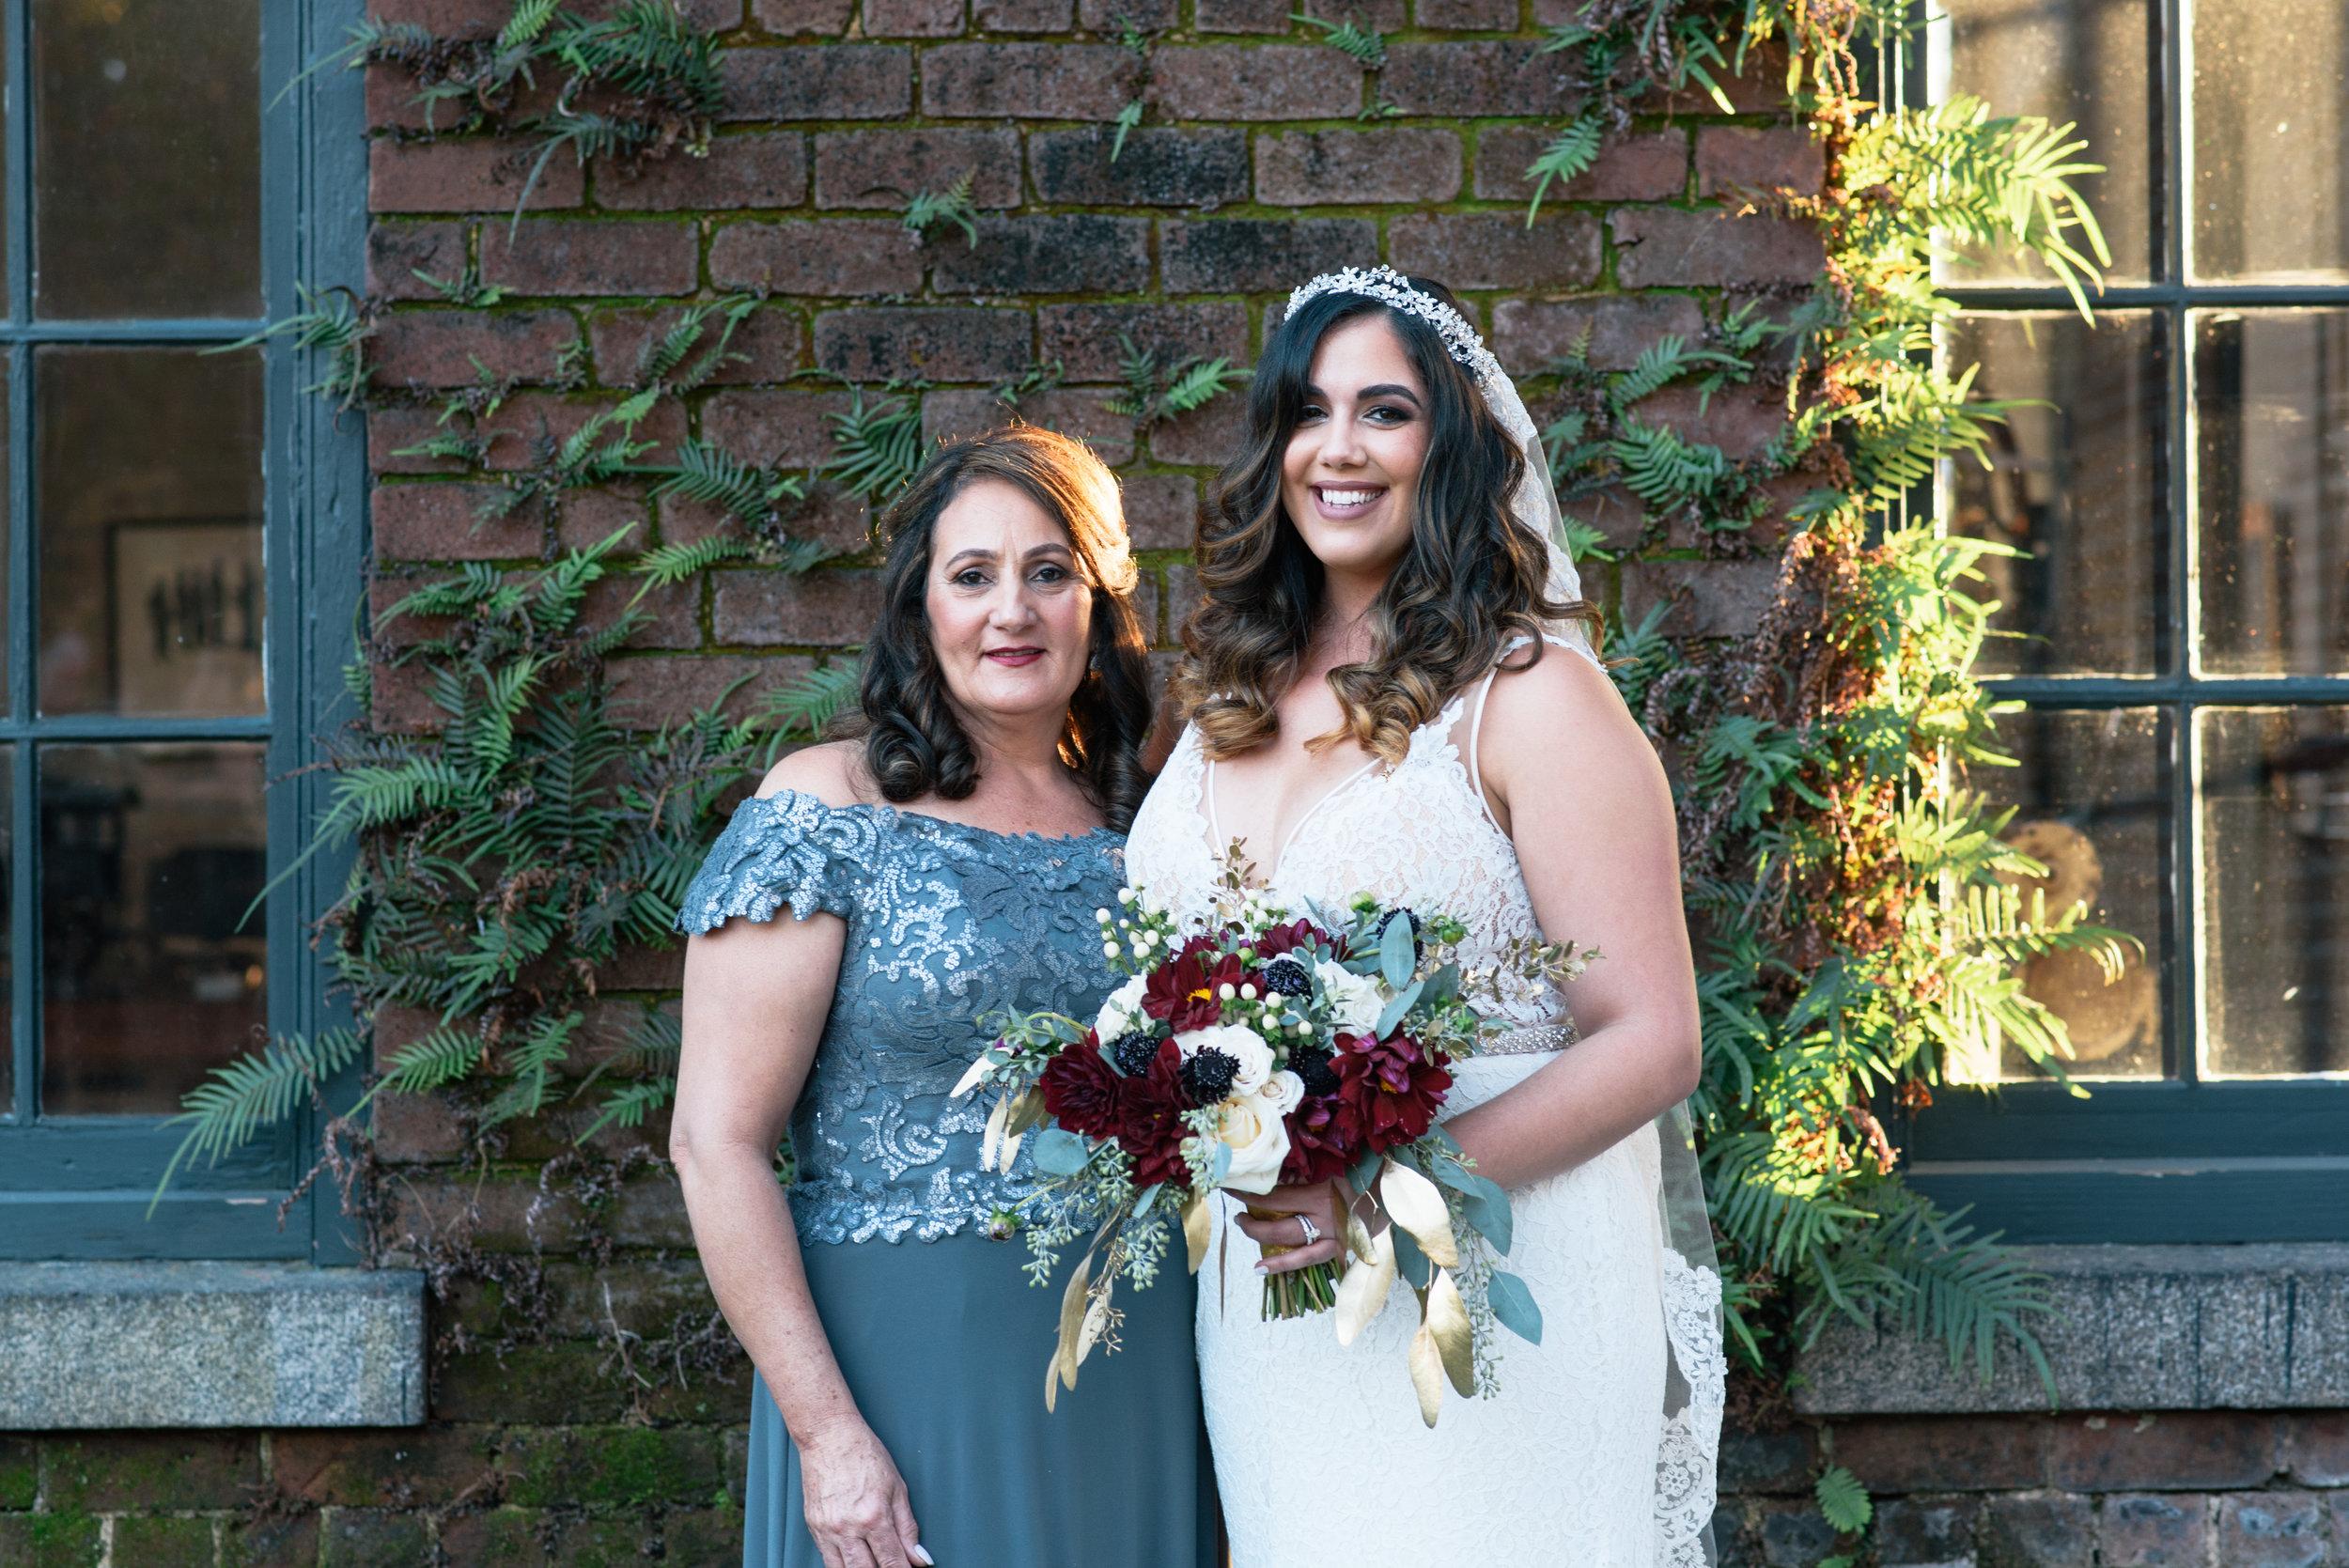 Iggy-and-yesenia-savannah-railroad-museum-wedding-meg-hill-photo- (541 of 1037).jpg